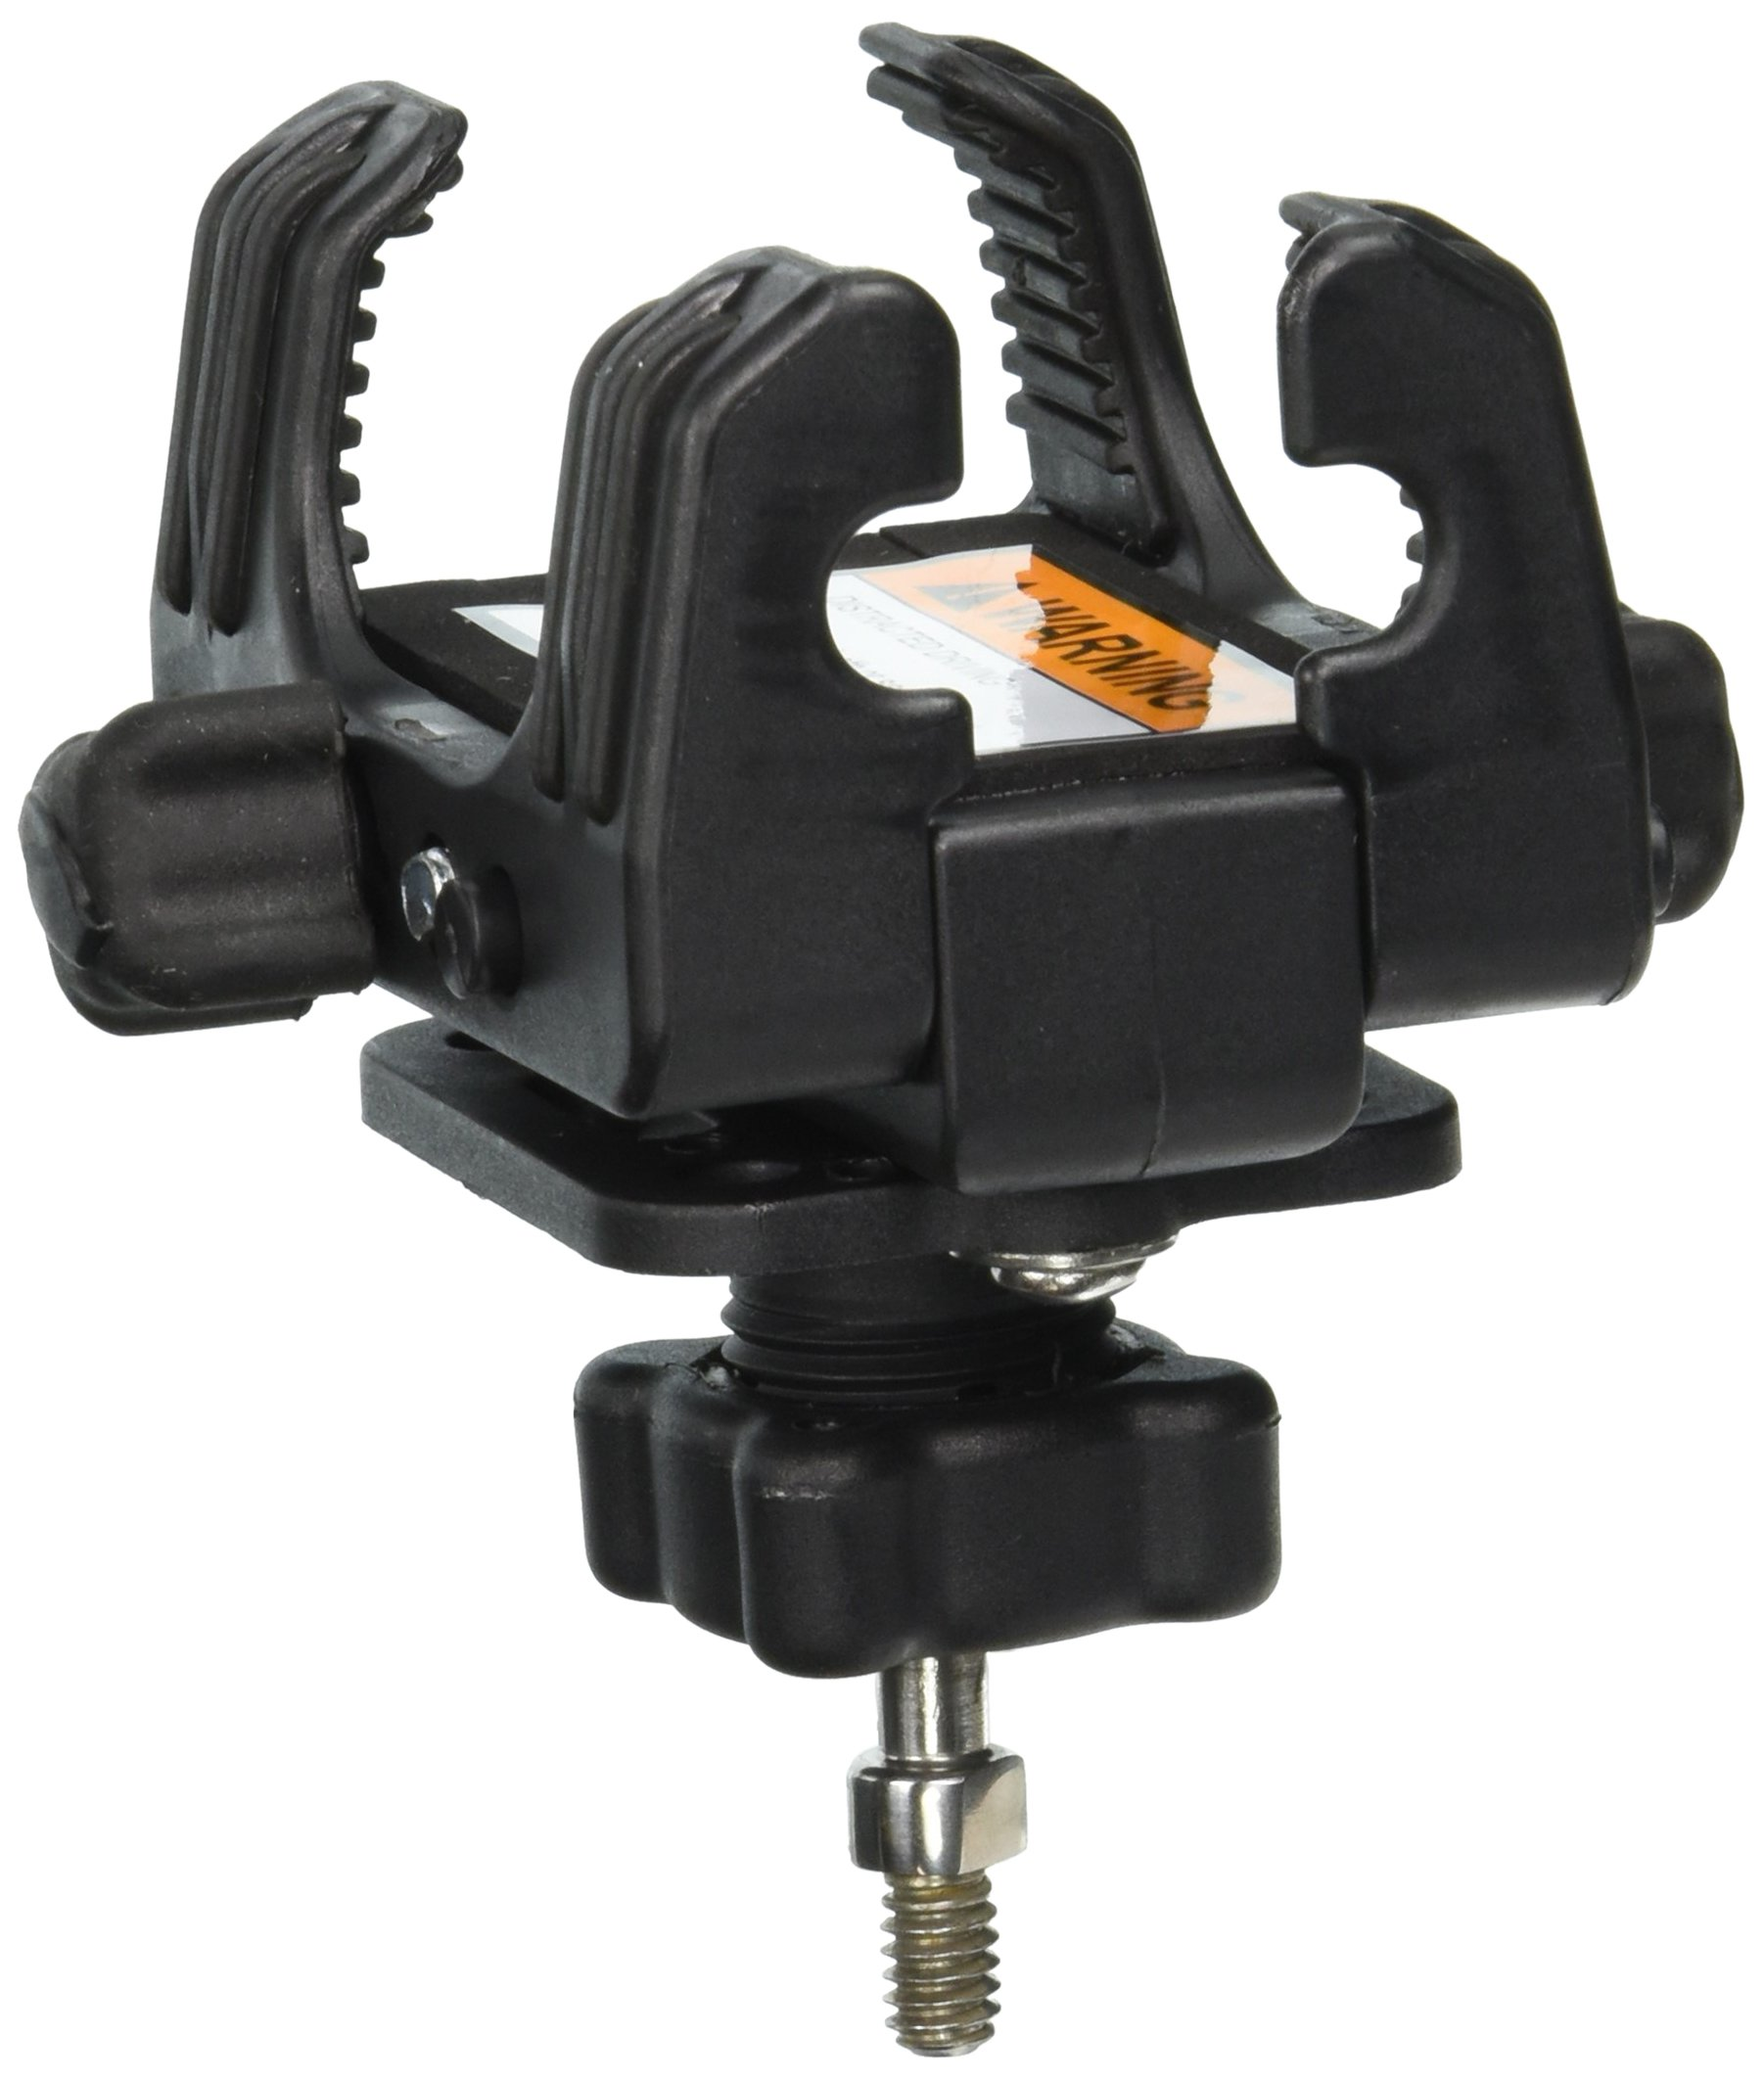 Kuryakyn 1686 Tech-Connect Left Side Standard Cradle Kit